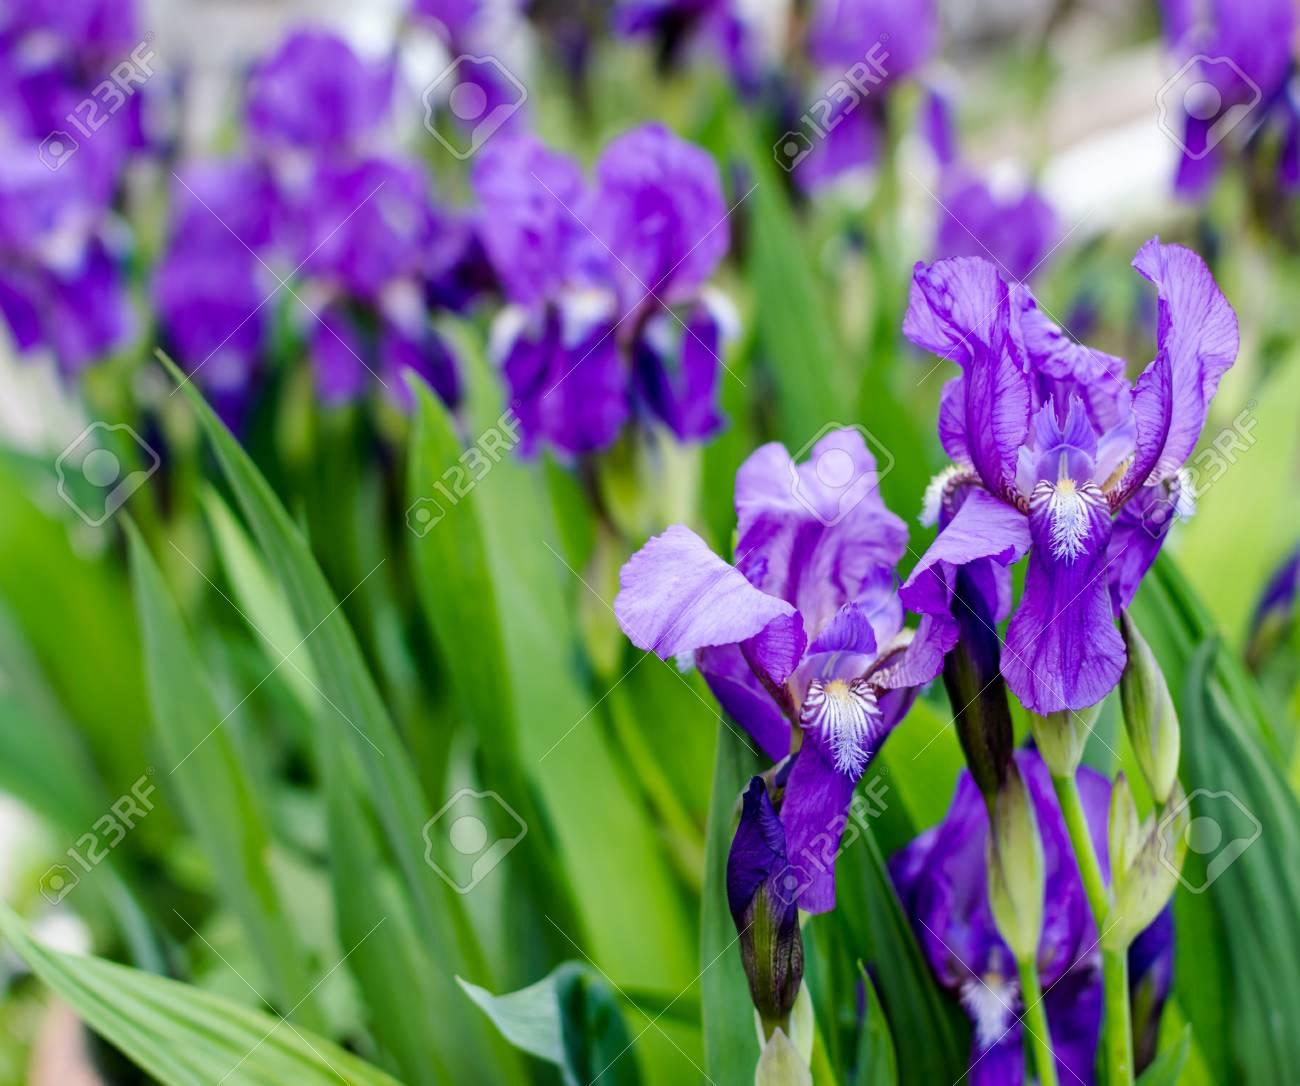 Bunch of iris flowers in full springtime bloom stock photo picture bunch of iris flowers in full springtime bloom stock photo 40559245 izmirmasajfo